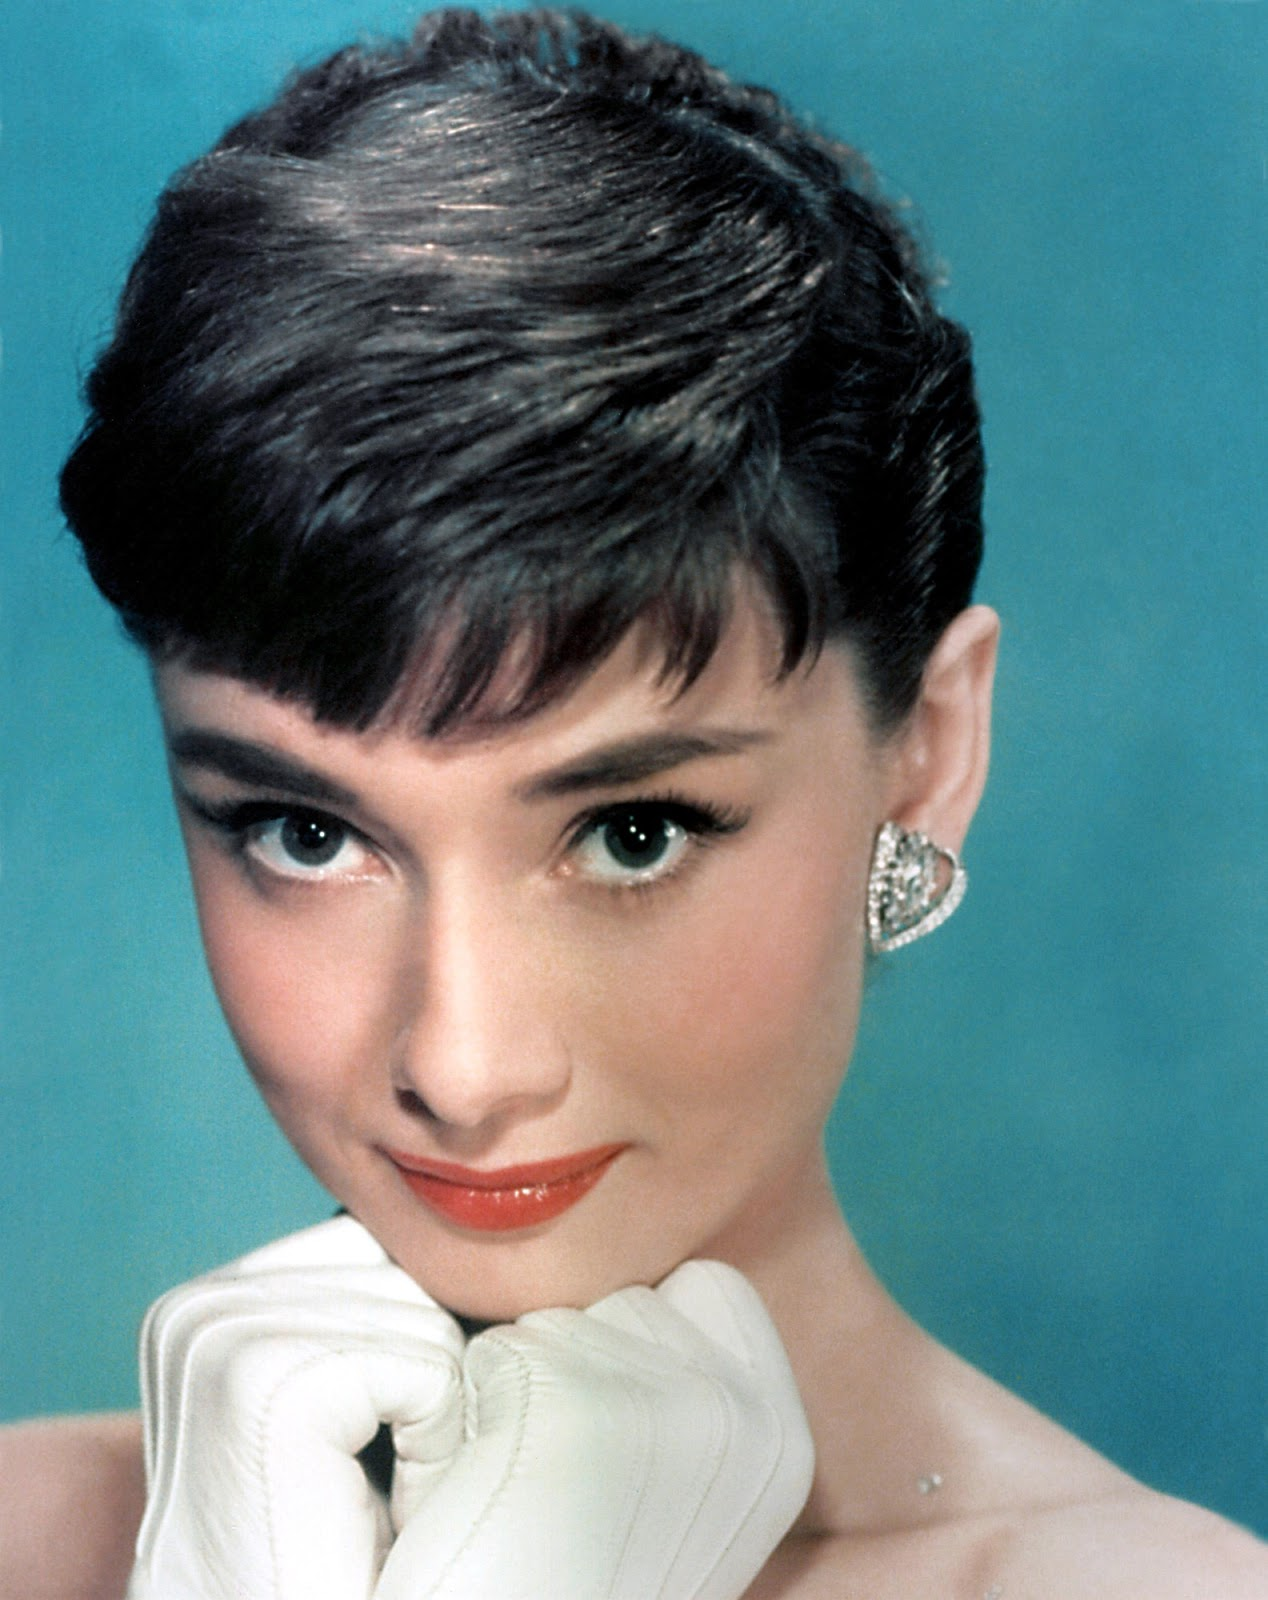 http://4.bp.blogspot.com/-m9oOhp2x5gQ/UOgjaUd_H2I/AAAAAAAAAkc/Cwz2kNxsuZU/s1600/Audrey-Hepburn-sabrina-1954-12036934-1585-2000.jpg